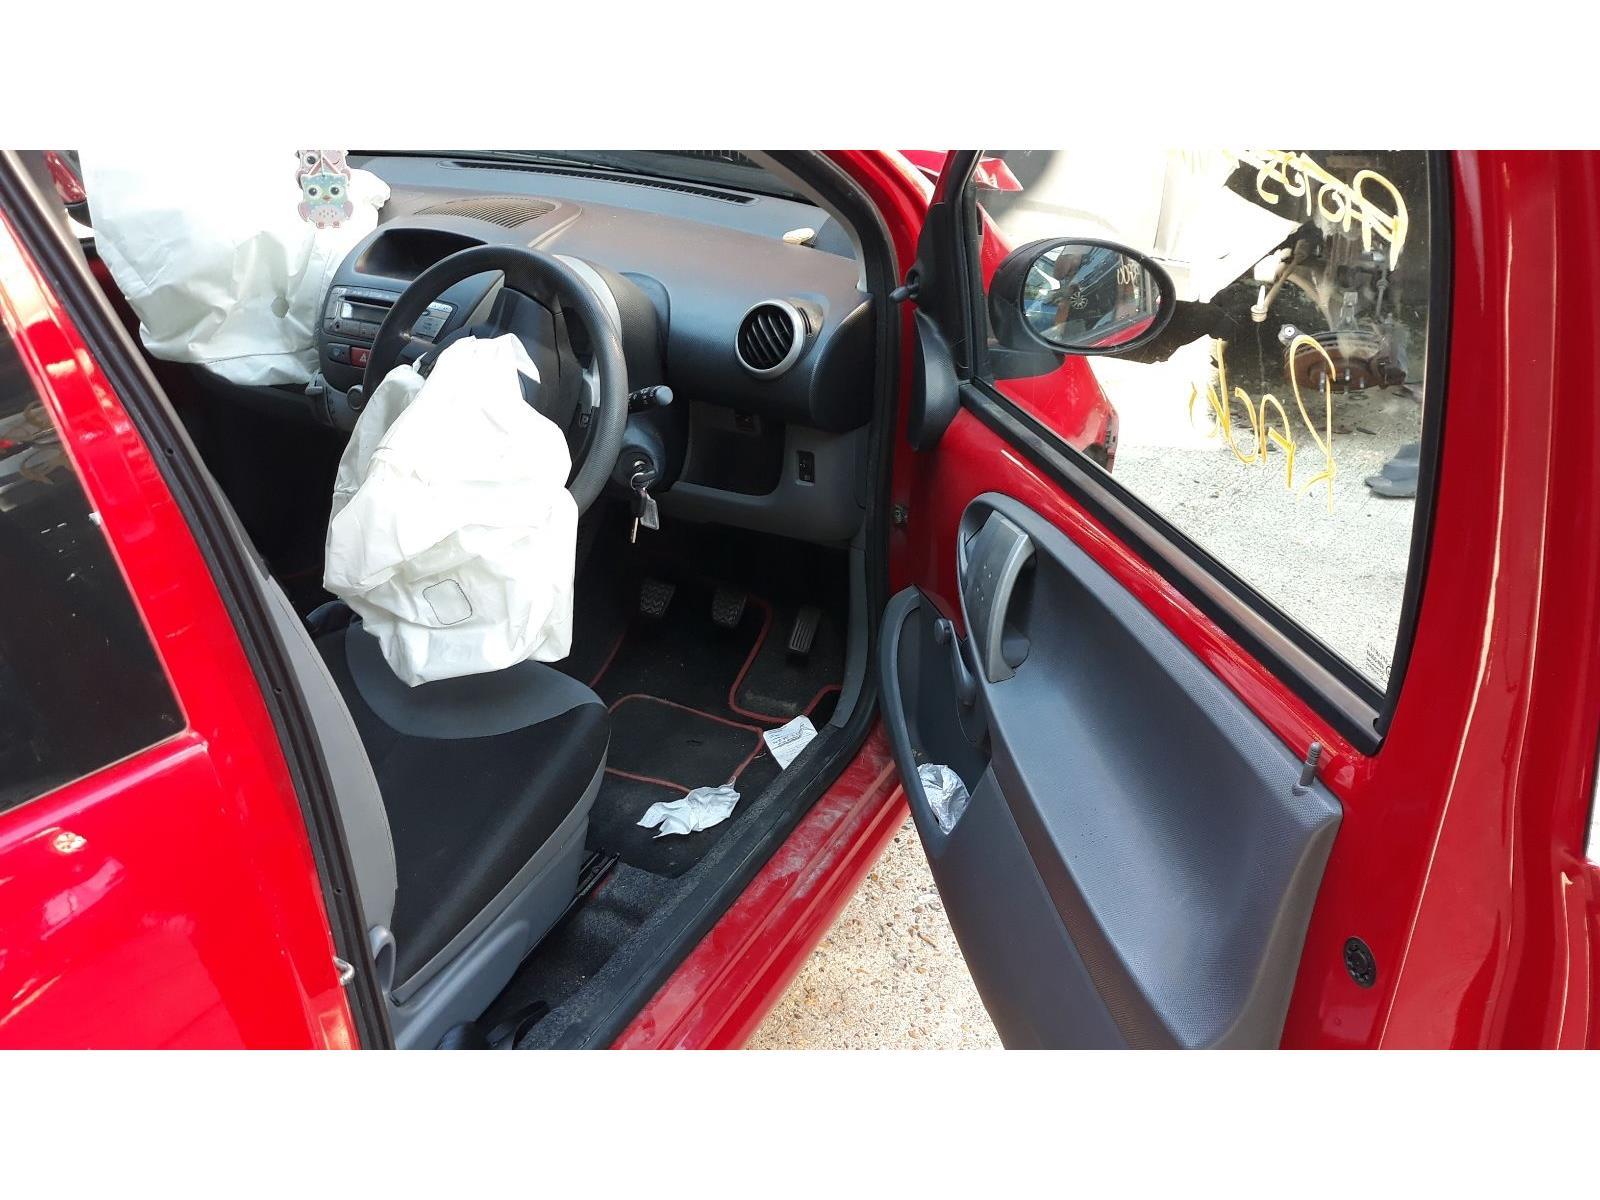 Citroen C1 2005 To 2008 Vibe 3 Door Hatchback / scrap / salvage car for  sale / auction | Silverlake Autoparts